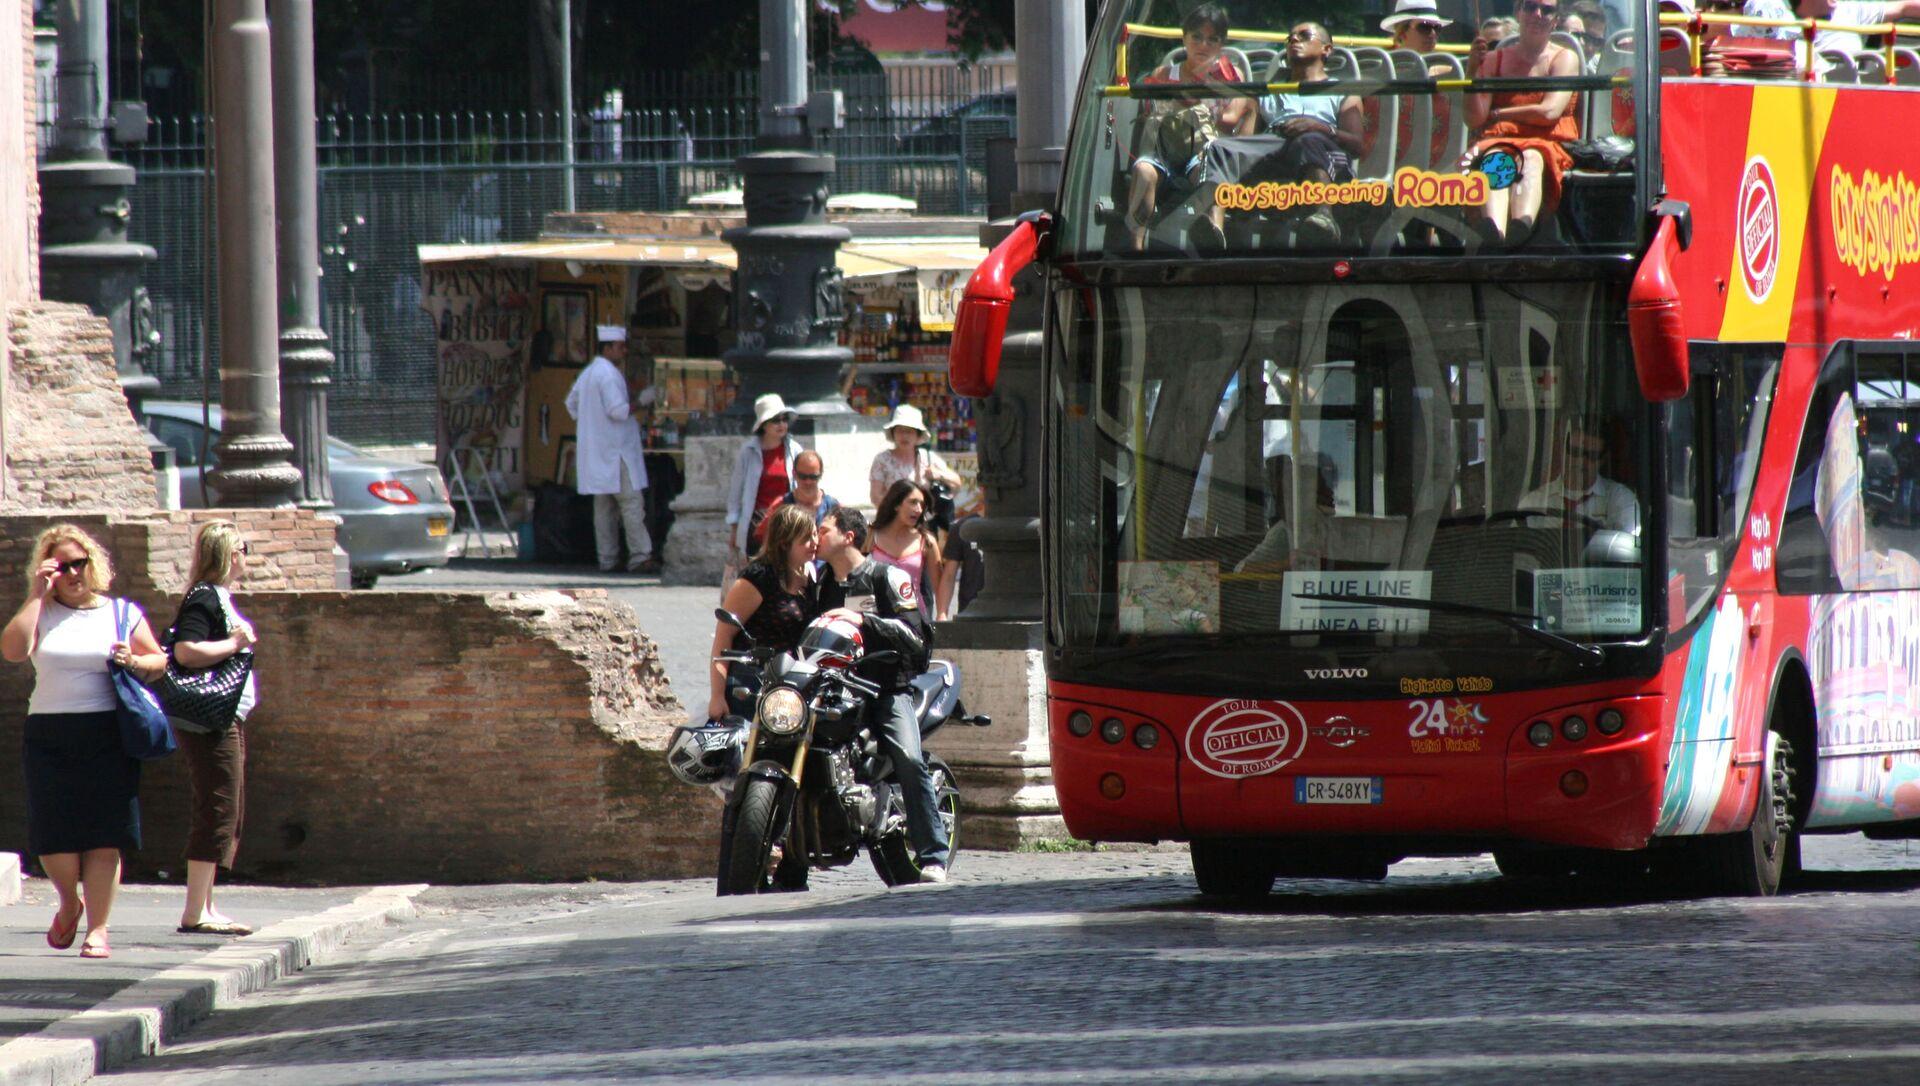 Roma, un autobus turistico - Sputnik Italia, 1920, 10.03.2021